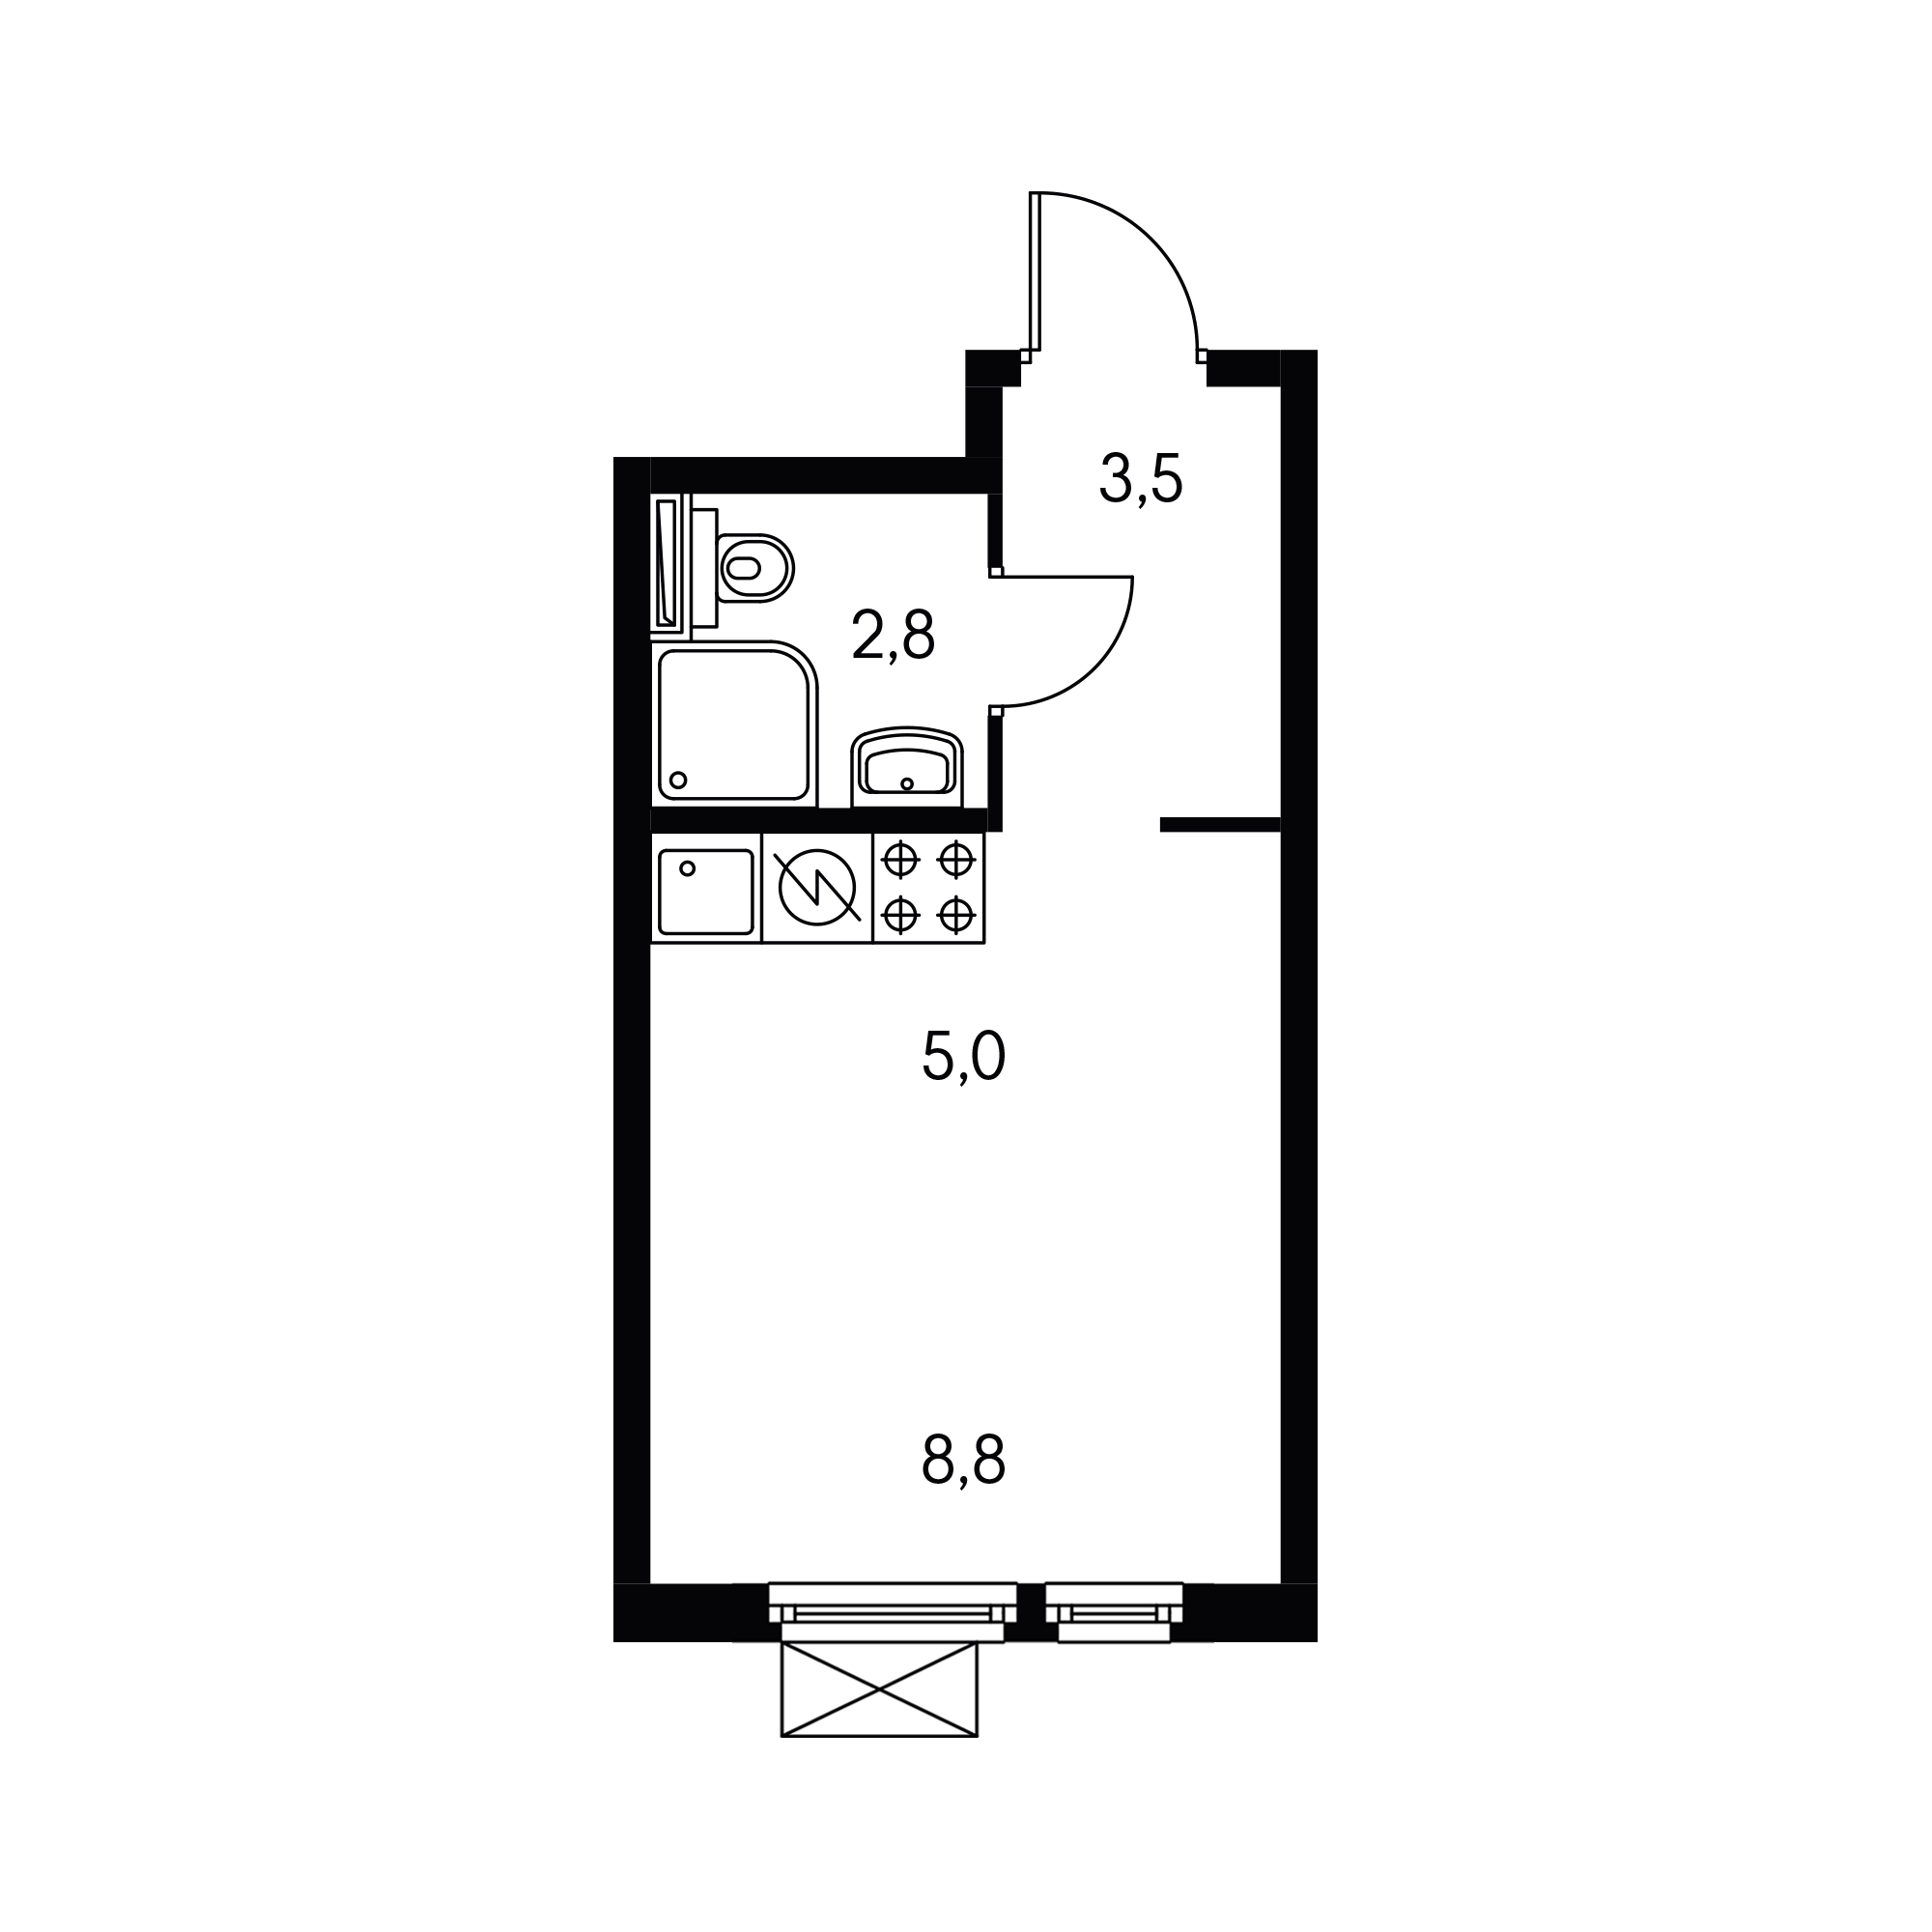 1NS1_3.6-4*